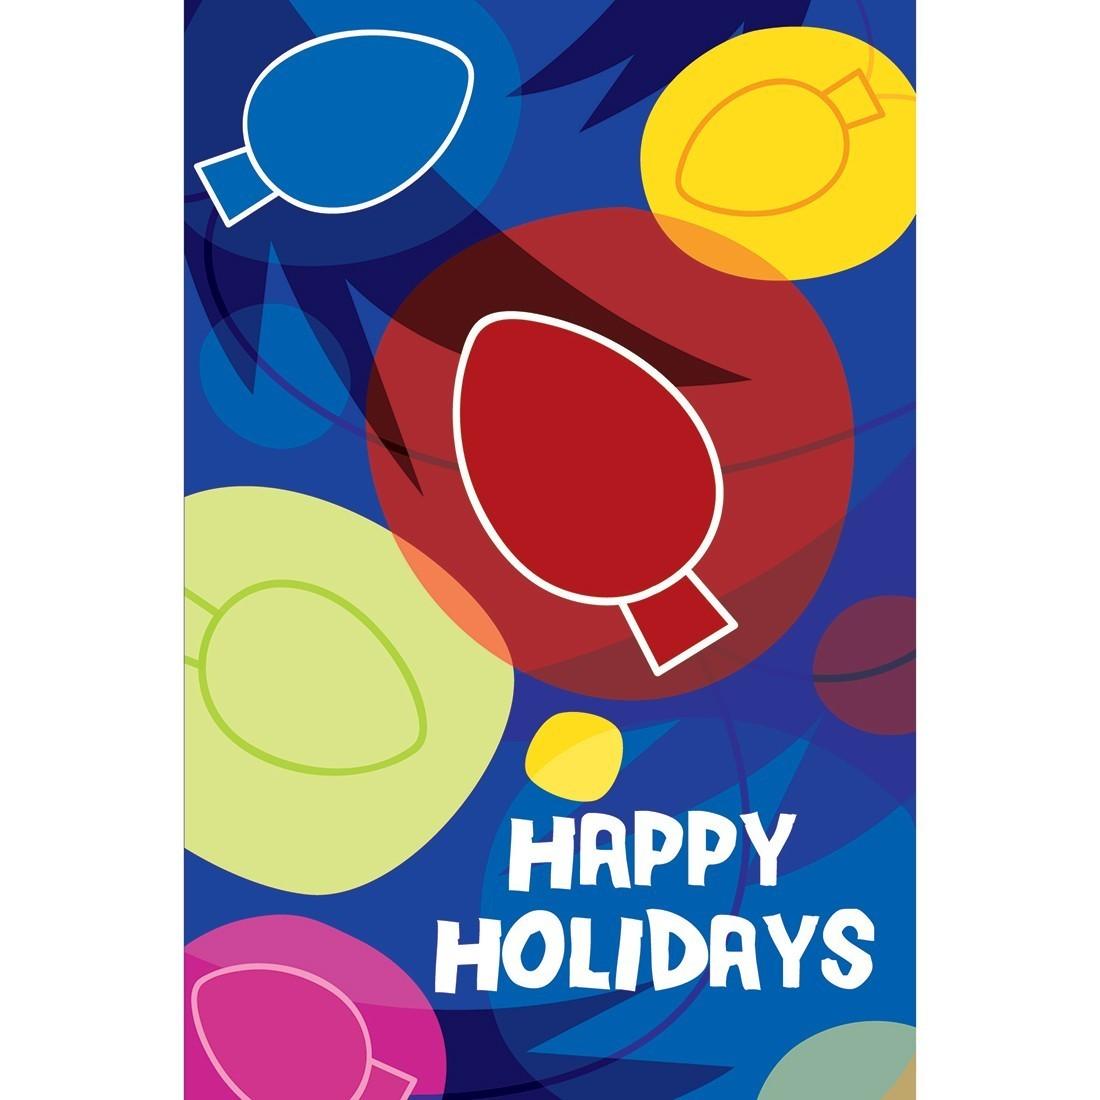 Happy Holidays Festive Lights Greeting Cards [image]